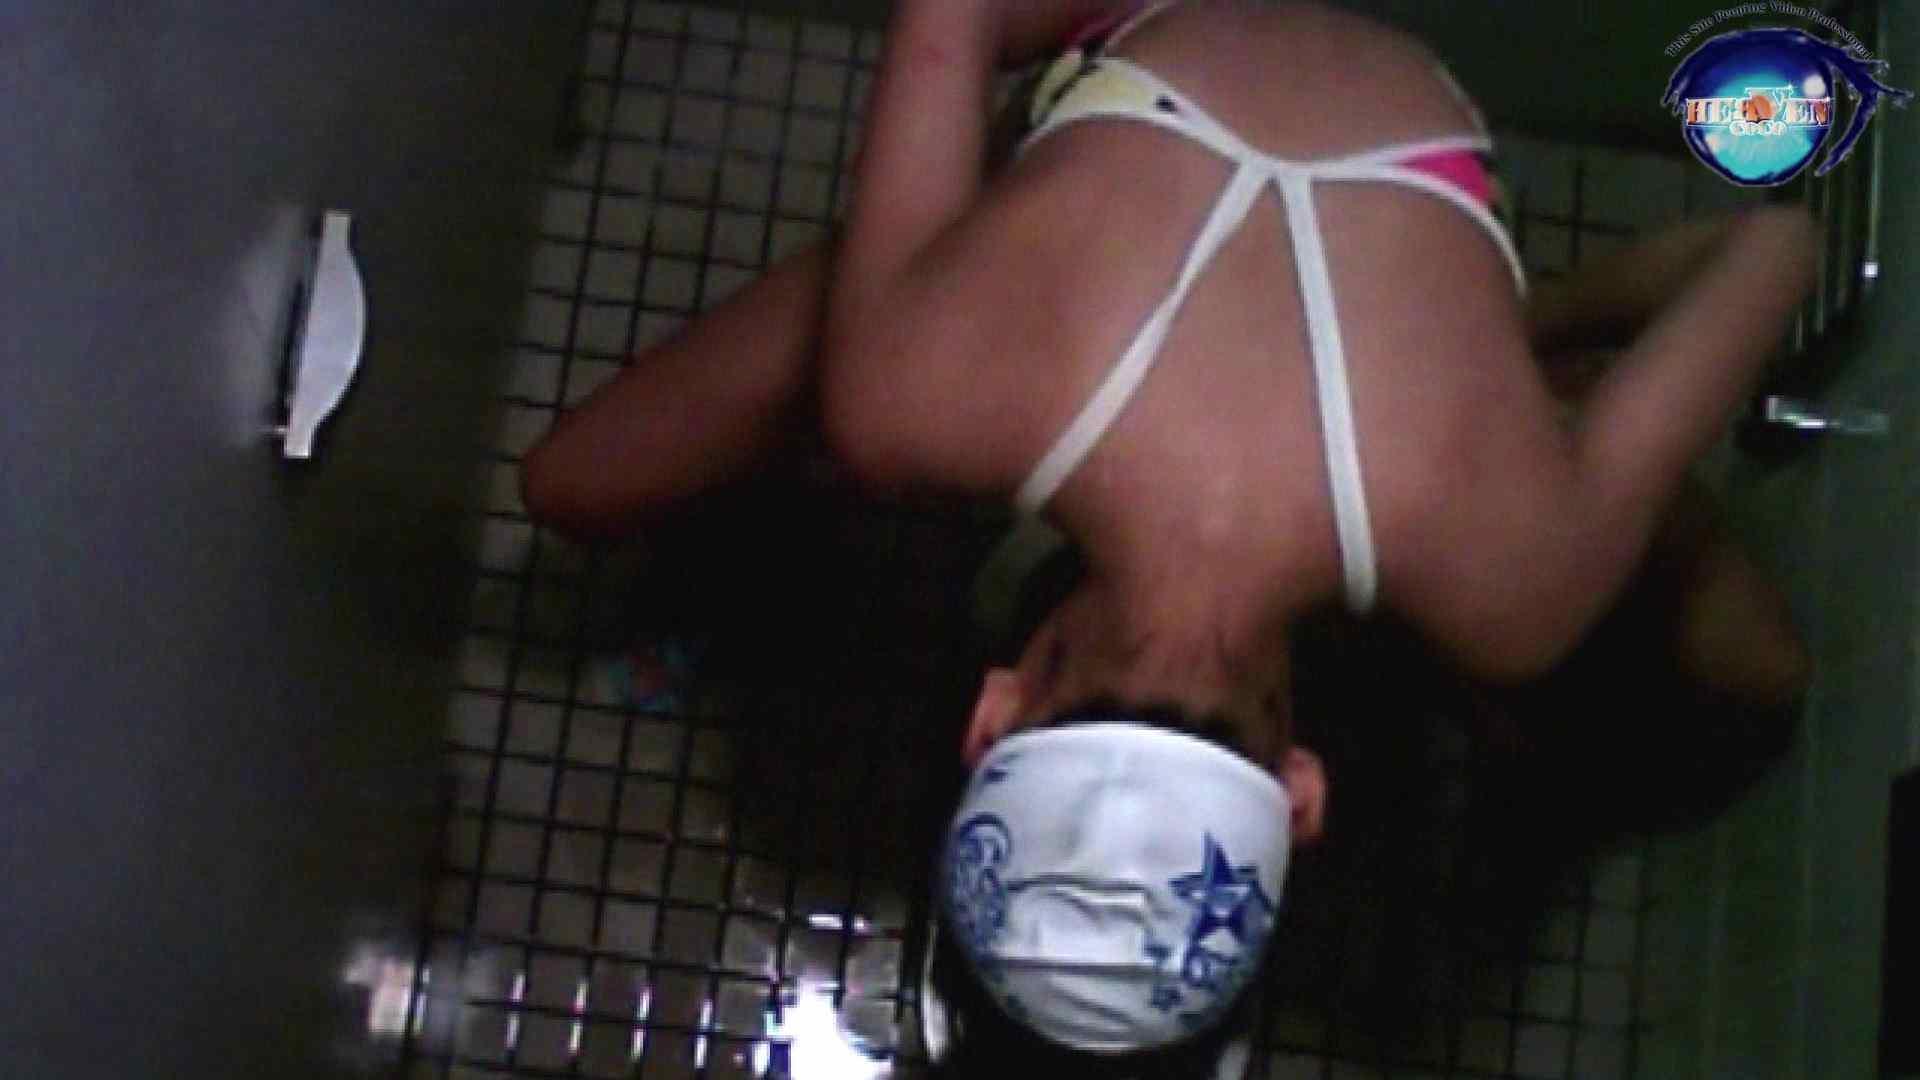 水泳大会選手の聖水 vol.09 全裸 オマンコ無修正動画無料 85pic 24